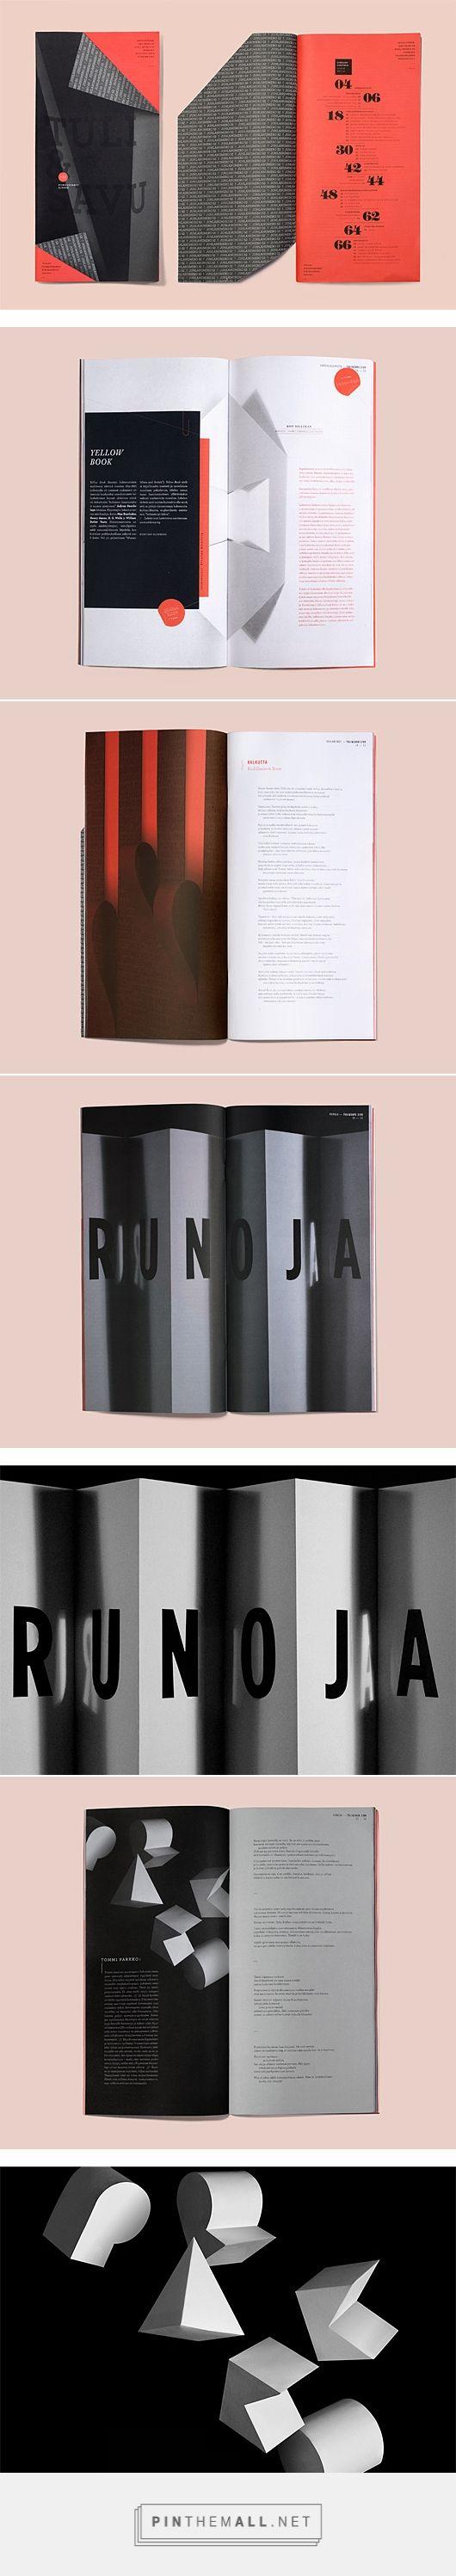 Tuli & Savu Magazine by Lotta Nieminen and Janine Rewell | Inspiration Grid | Design Inspiration - created via https://pinthemall.net